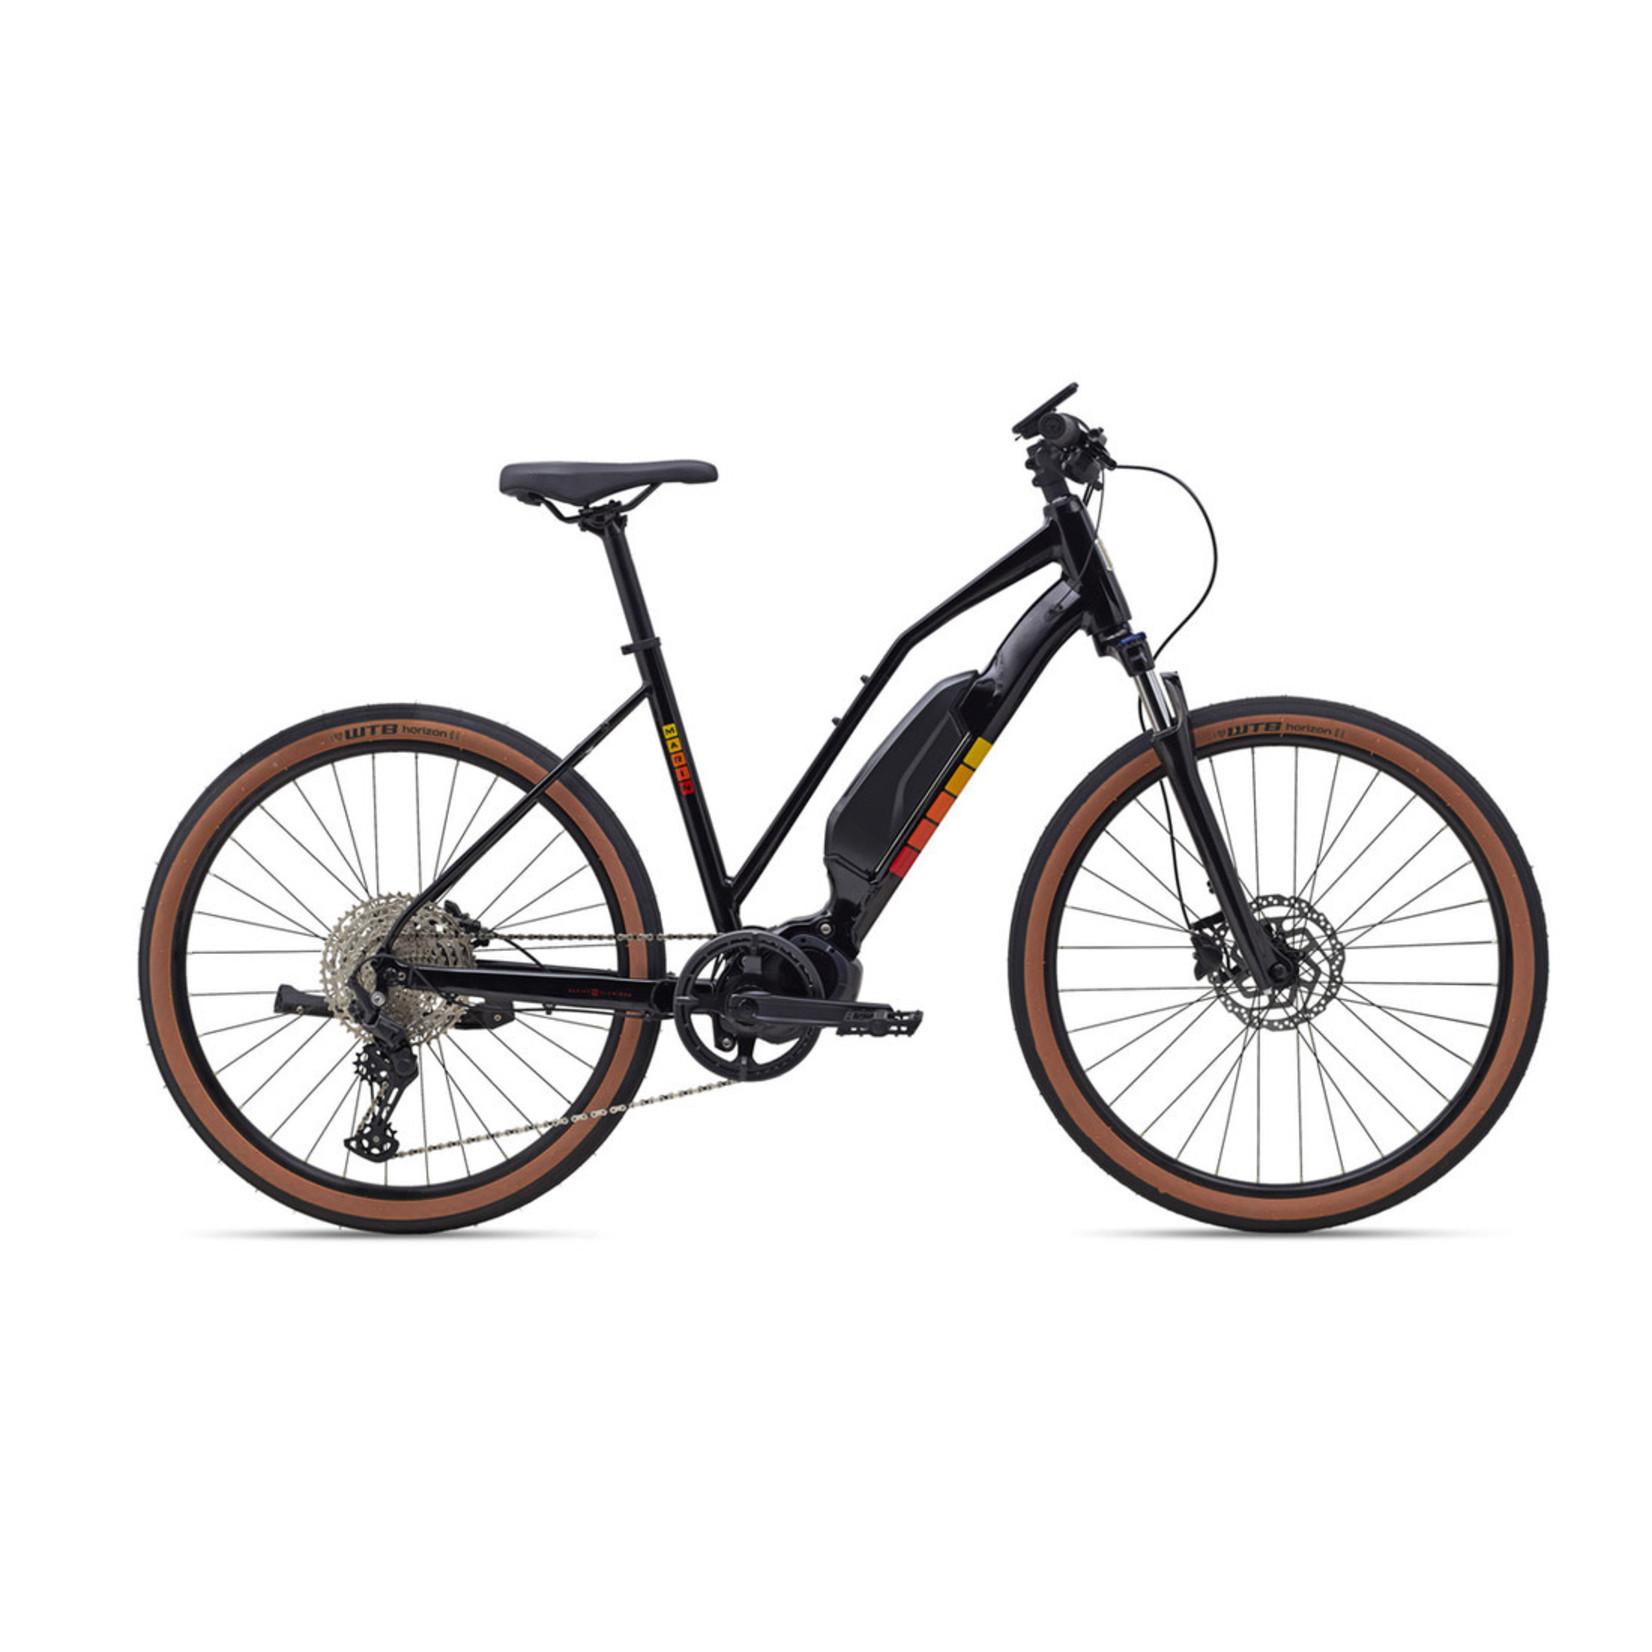 Marin Bikes Marin Sausalito E2 Step Through (2022)